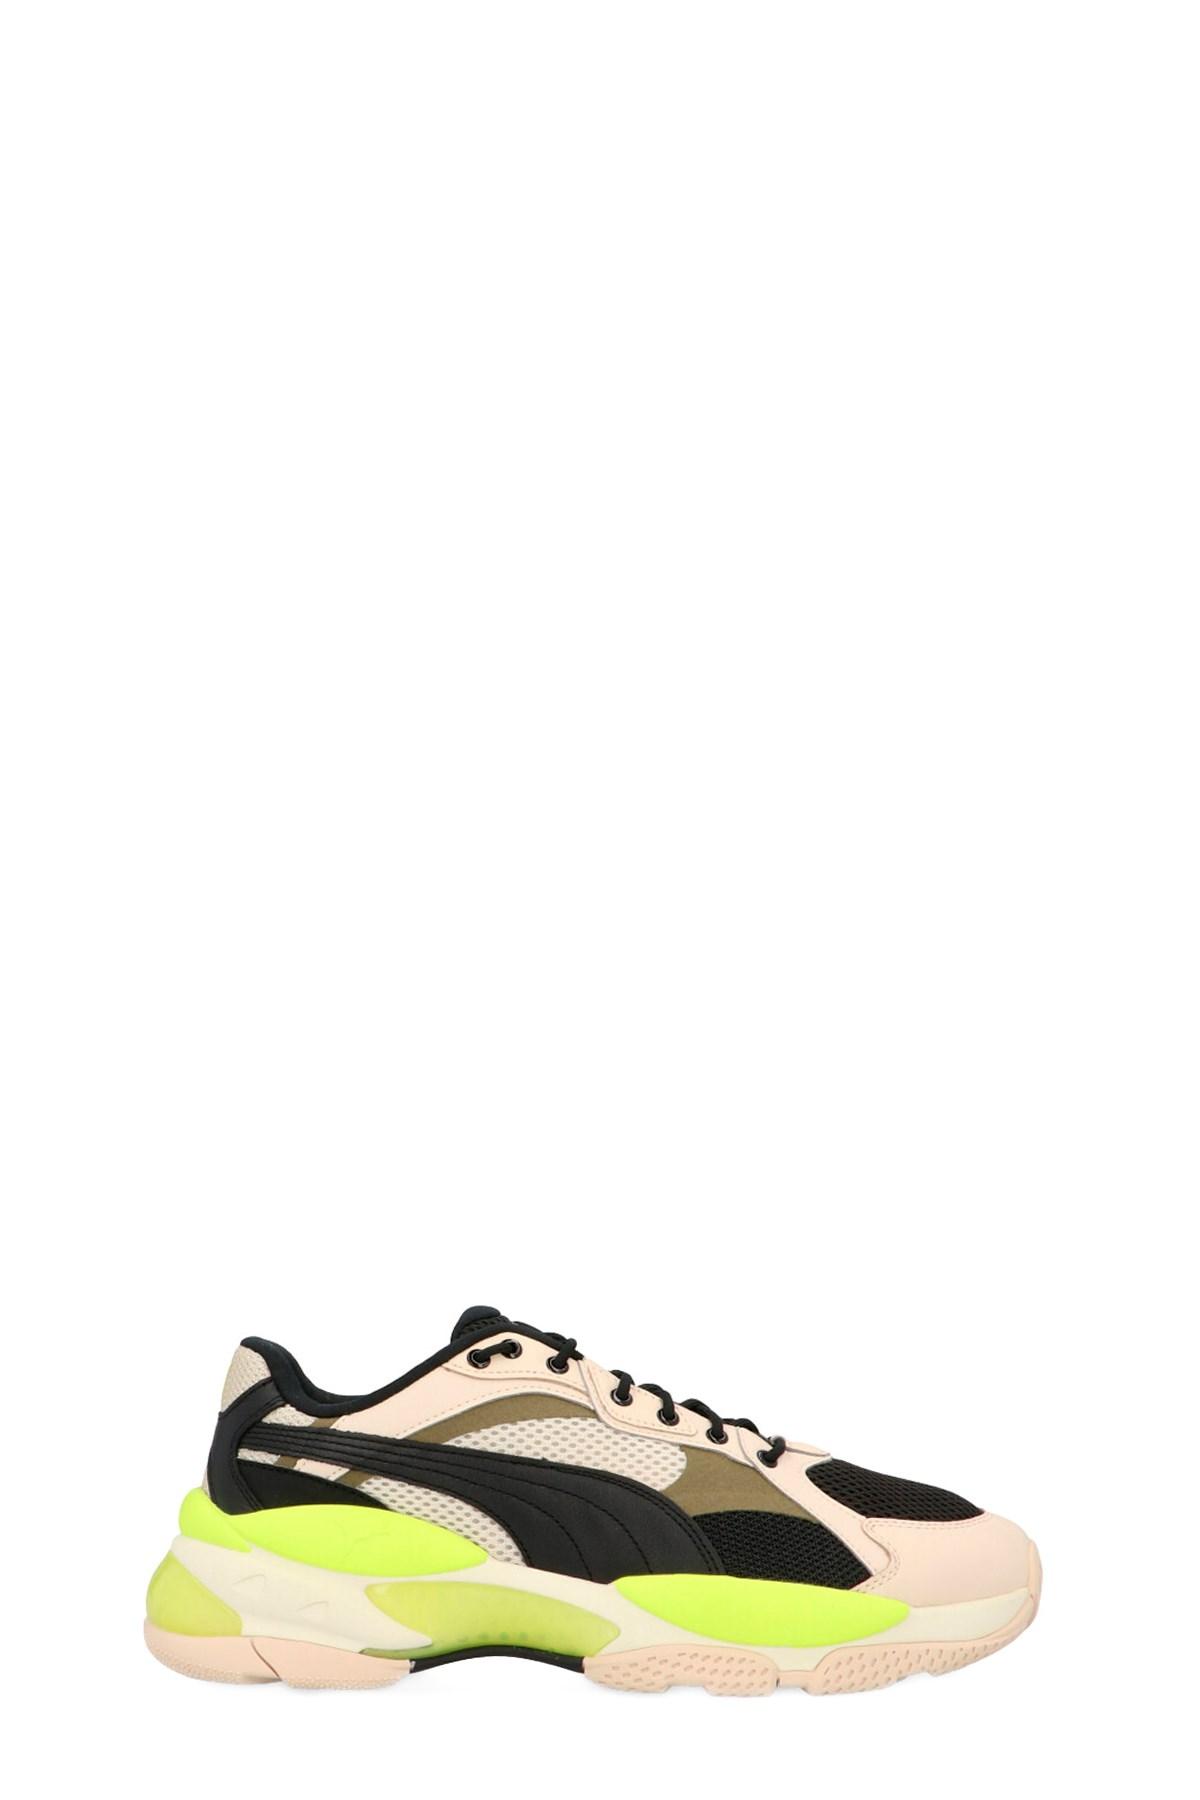 puma 'Liquid cell epsylon' sneakers